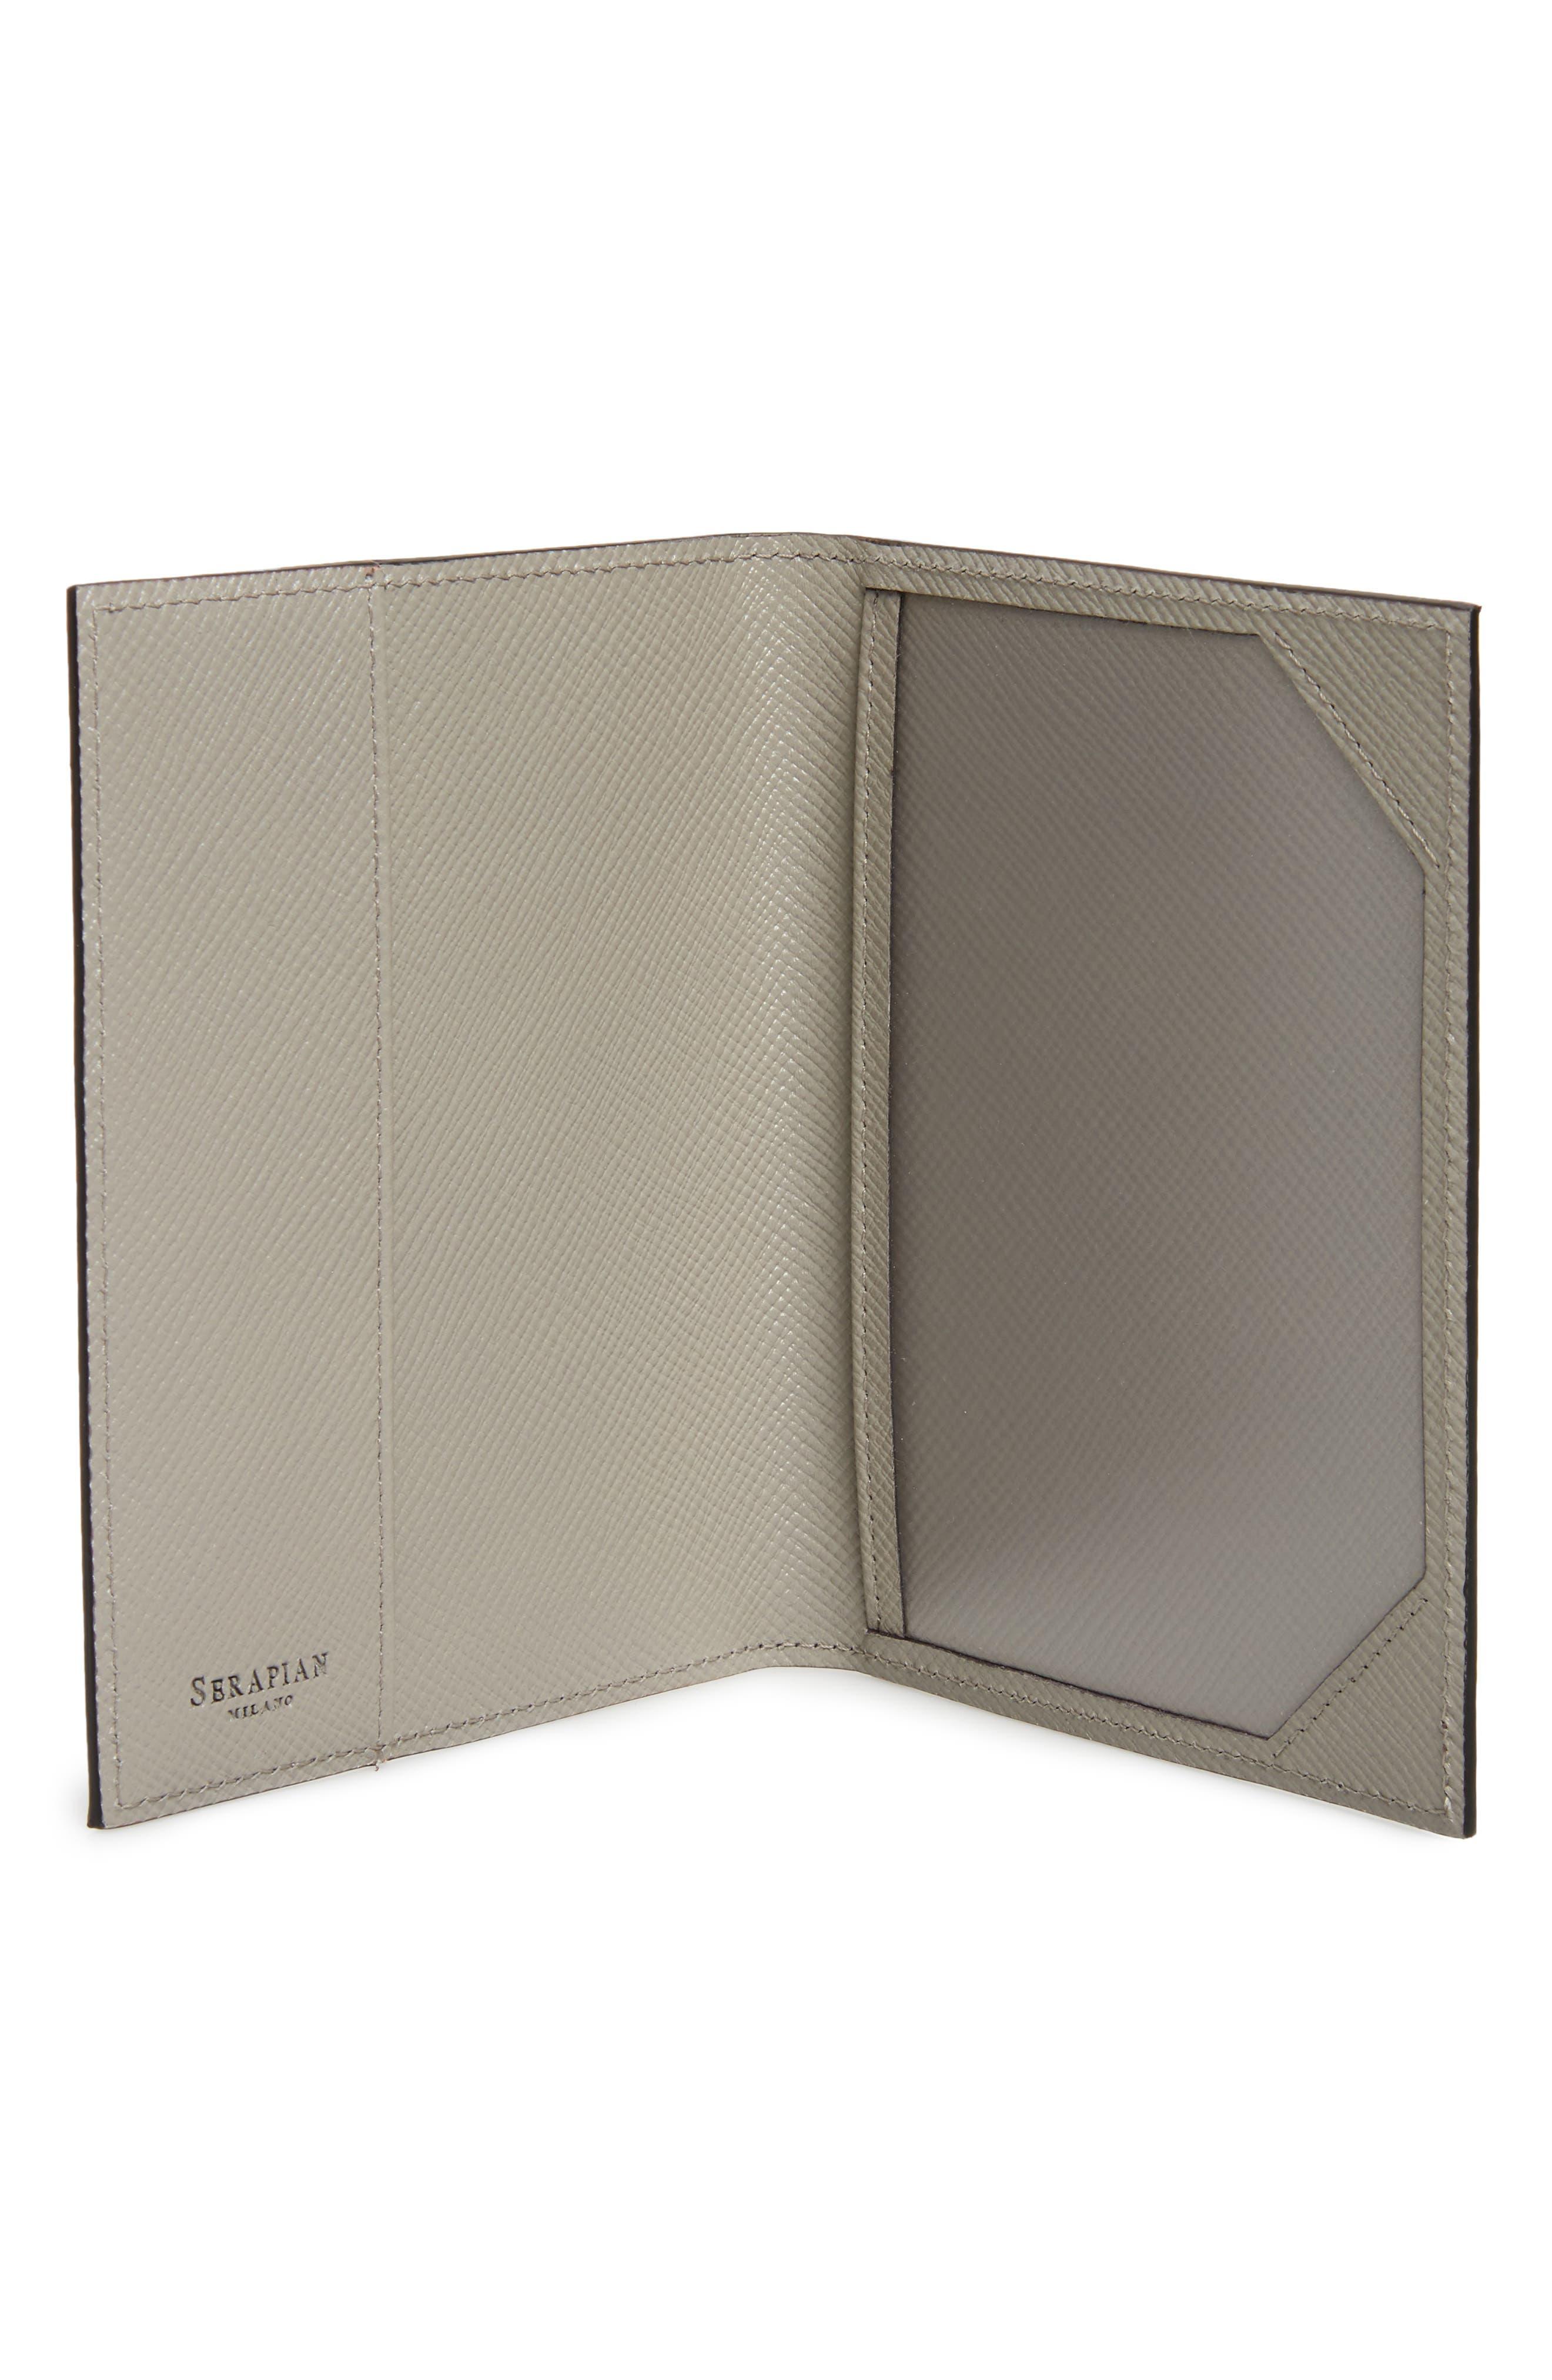 Evolution Leather Passport Case,                             Alternate thumbnail 2, color,                             020